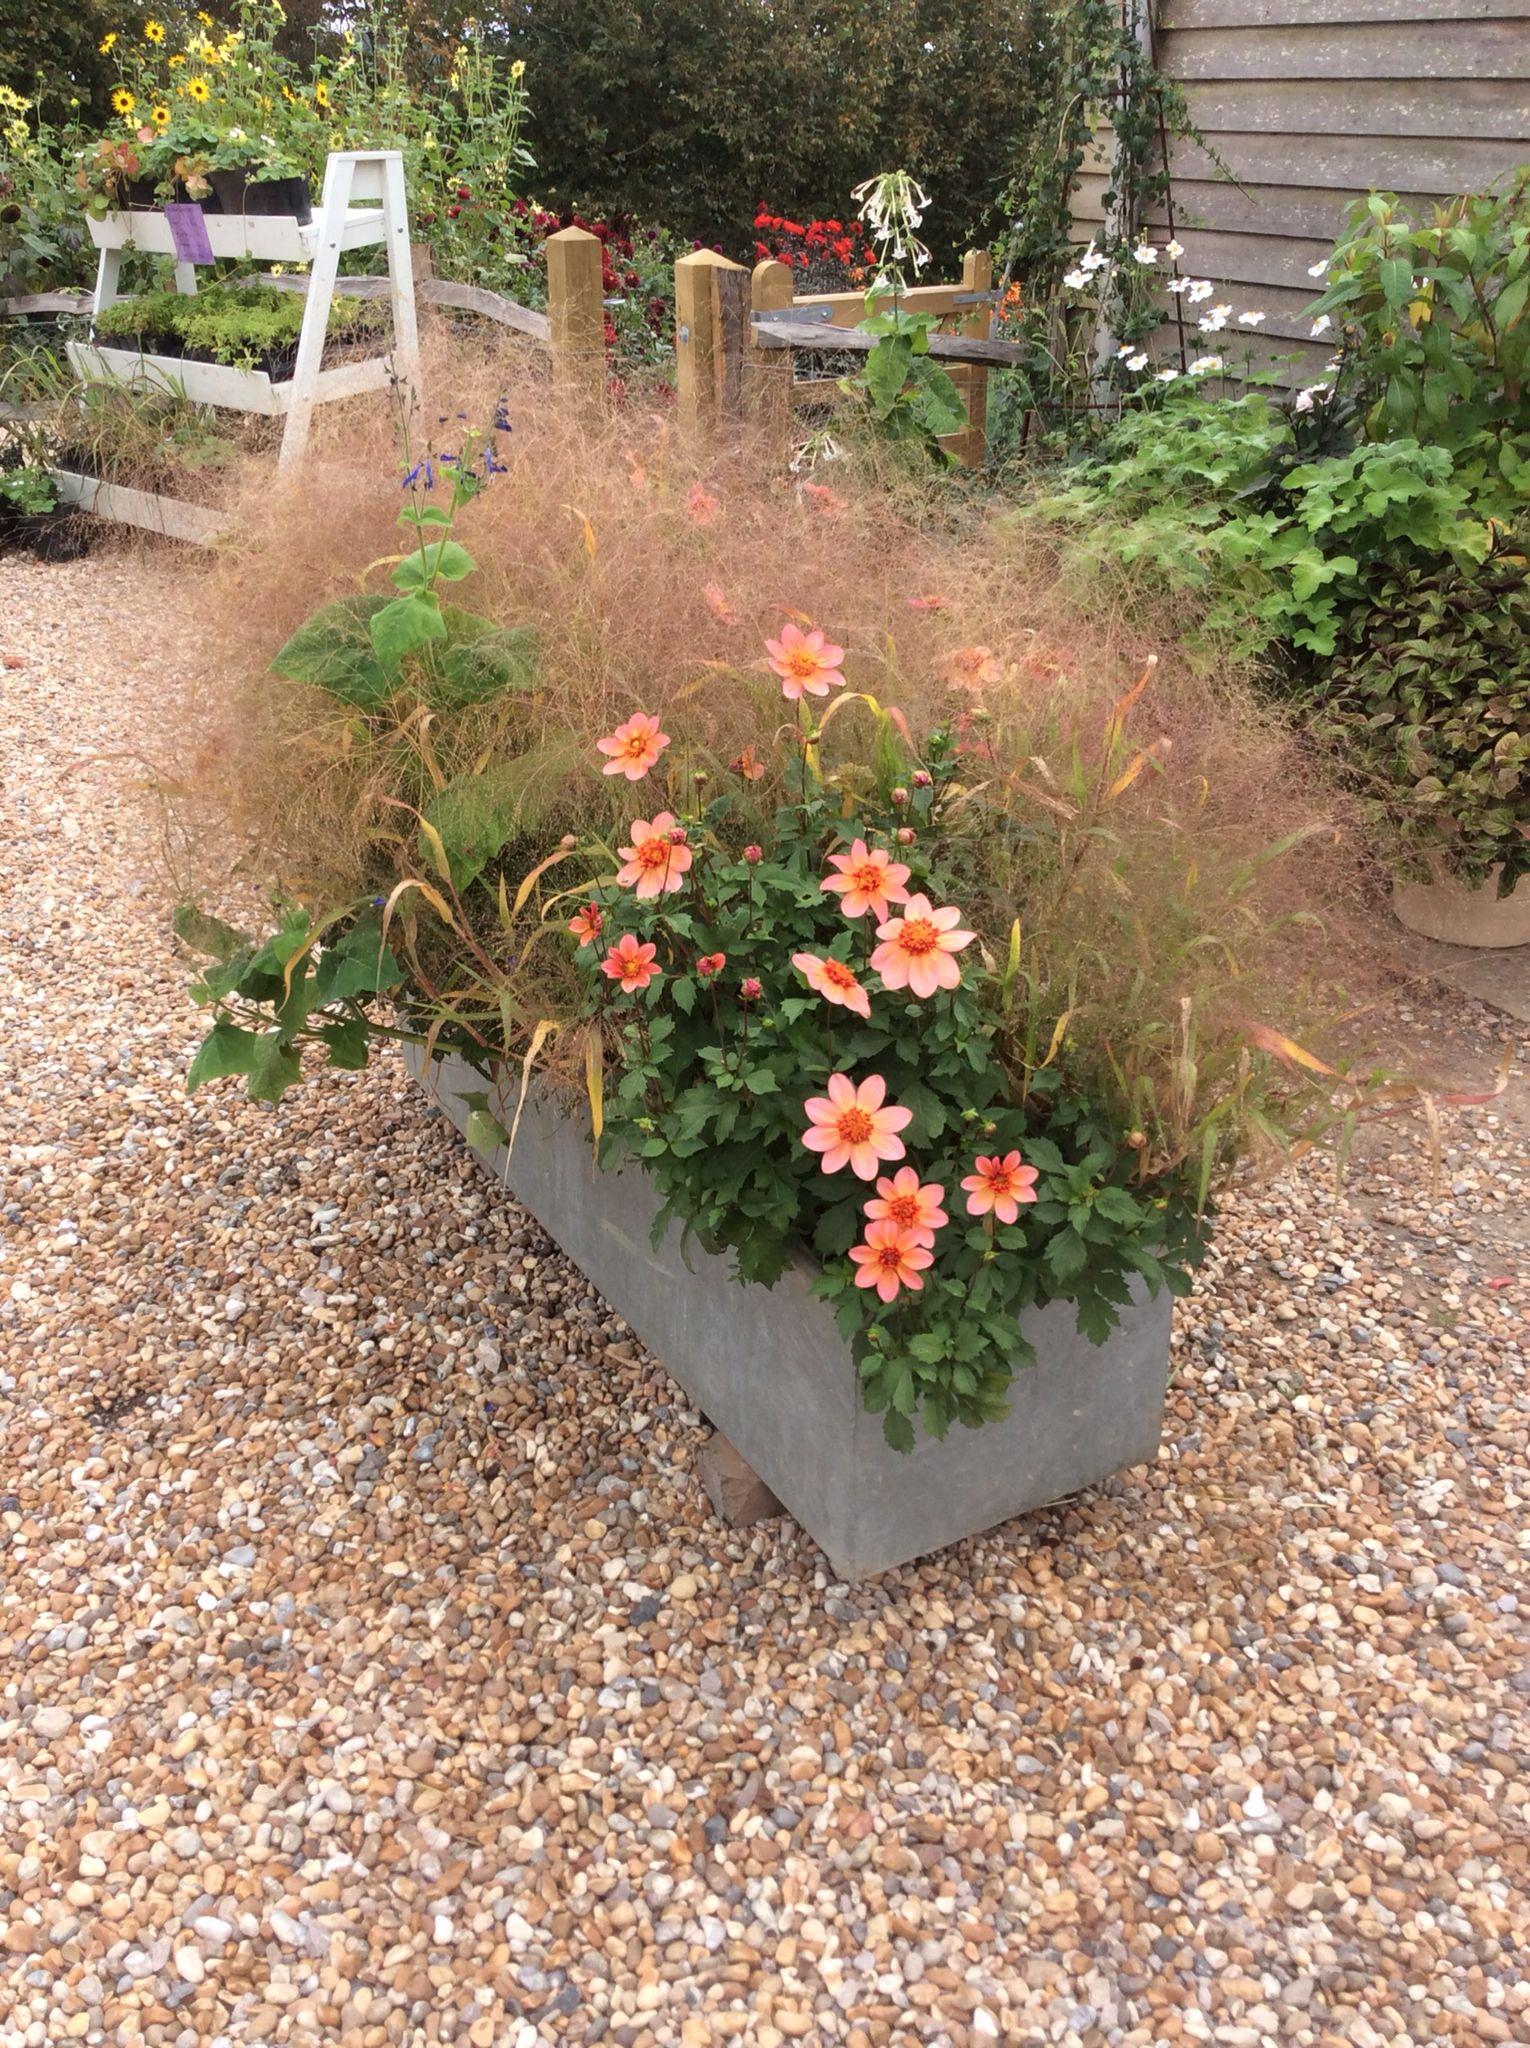 At Perch Hill (Sarah Raven\'s beautiful Garden): Isn\'t it lovely ...